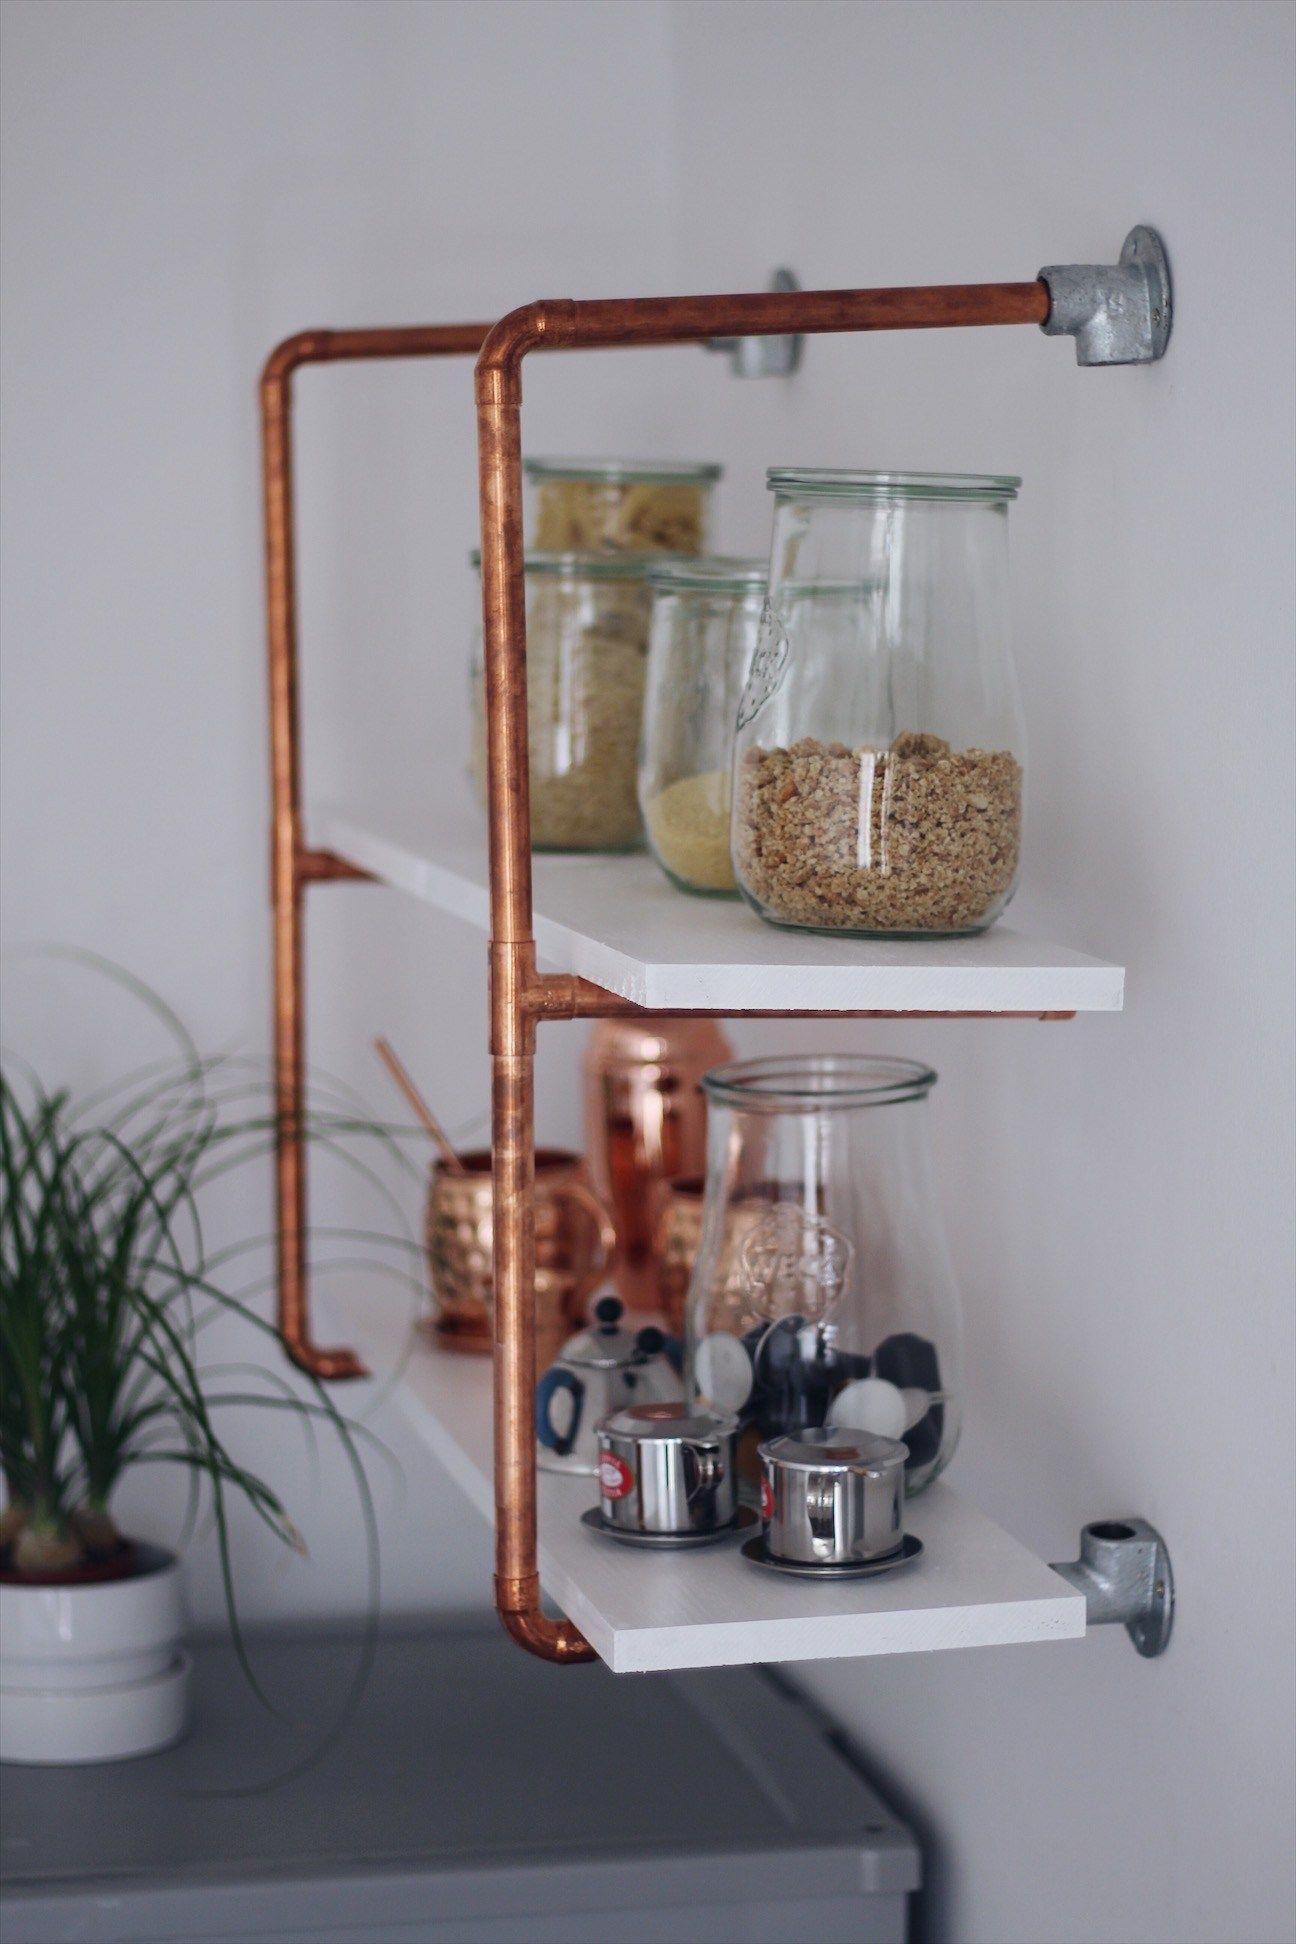 DIY for your selfmade copper shelf | DIY Anleitung für dein ...